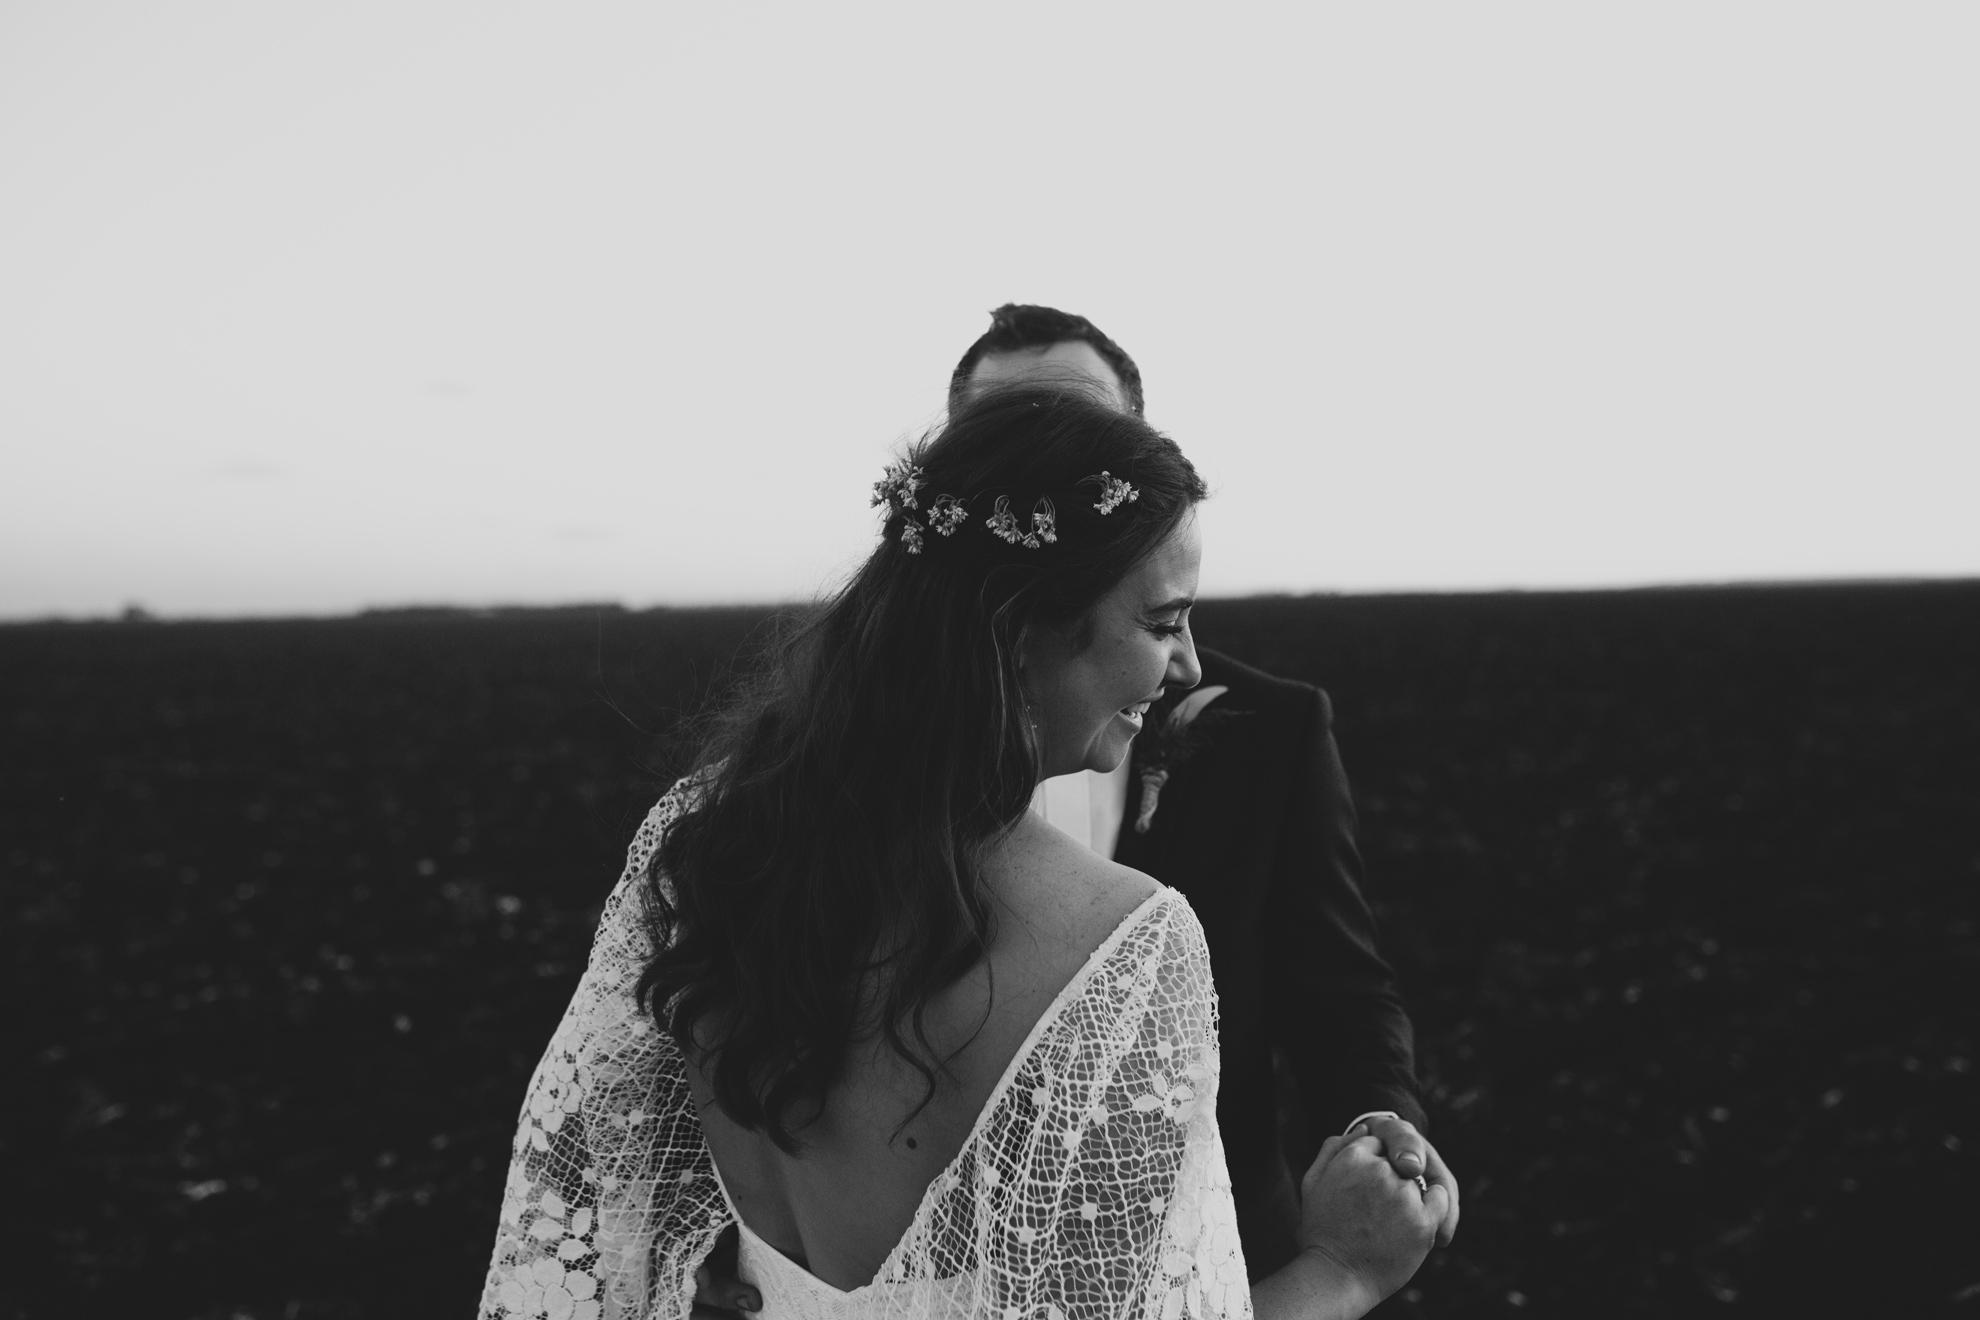 076-Jason_Jessie_Dalby_Country_Wedding.jpg